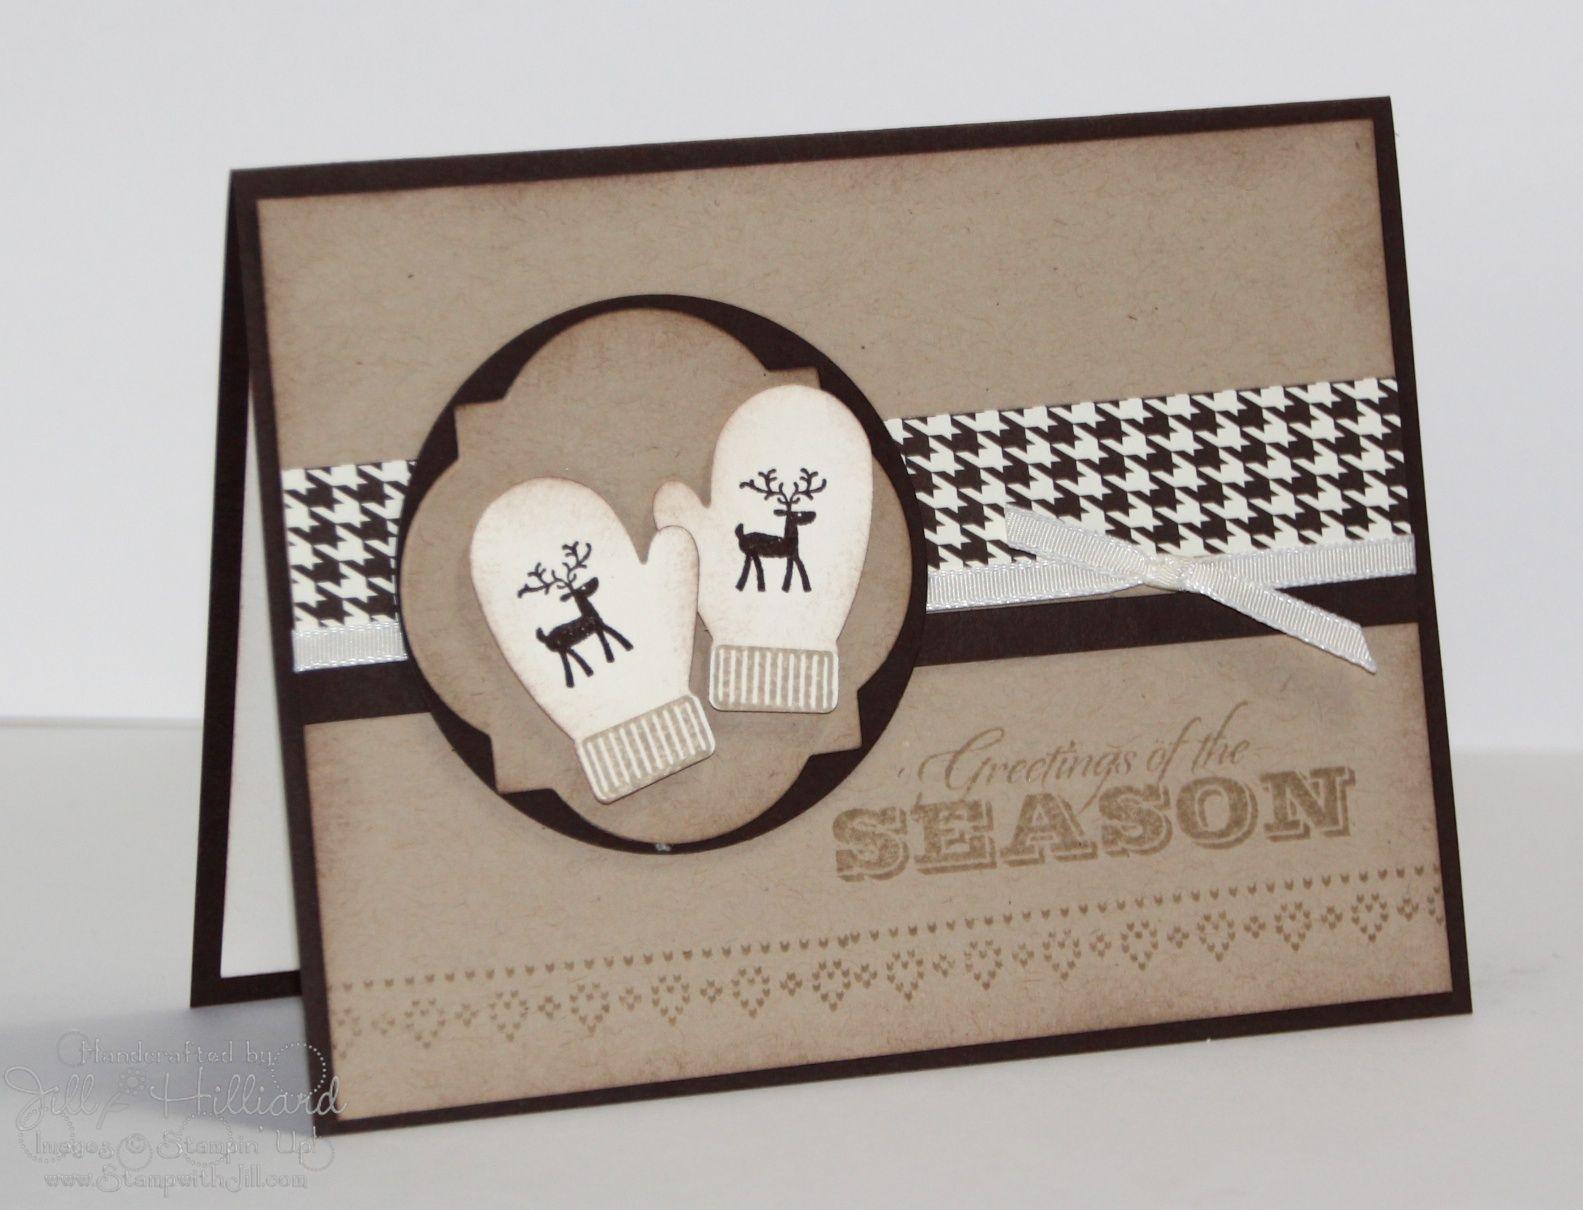 Jills Card Creations Greetings Of The Season Christmas Cards